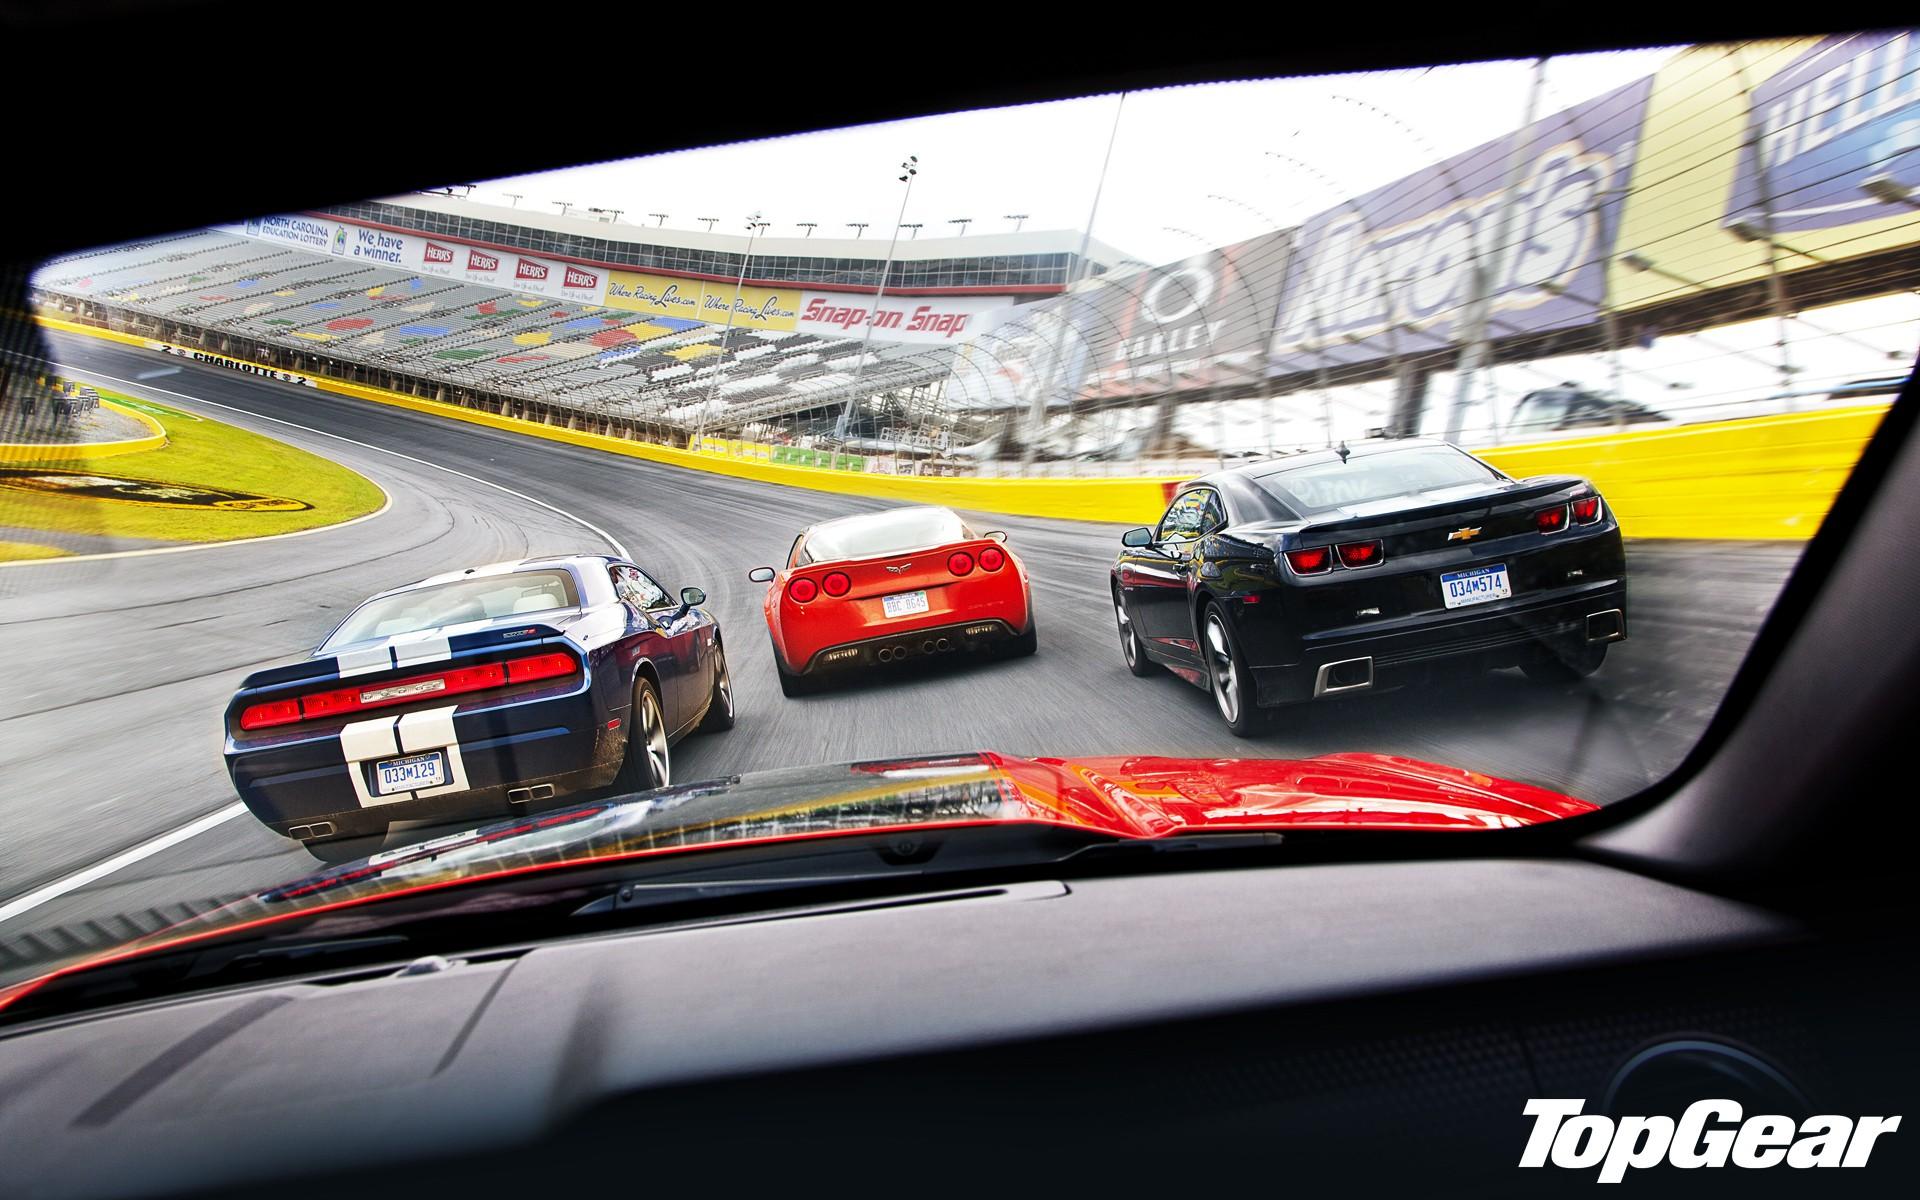 Top Gear Muscle Cars Chevrolet Camaro Corvette Racing Challenger